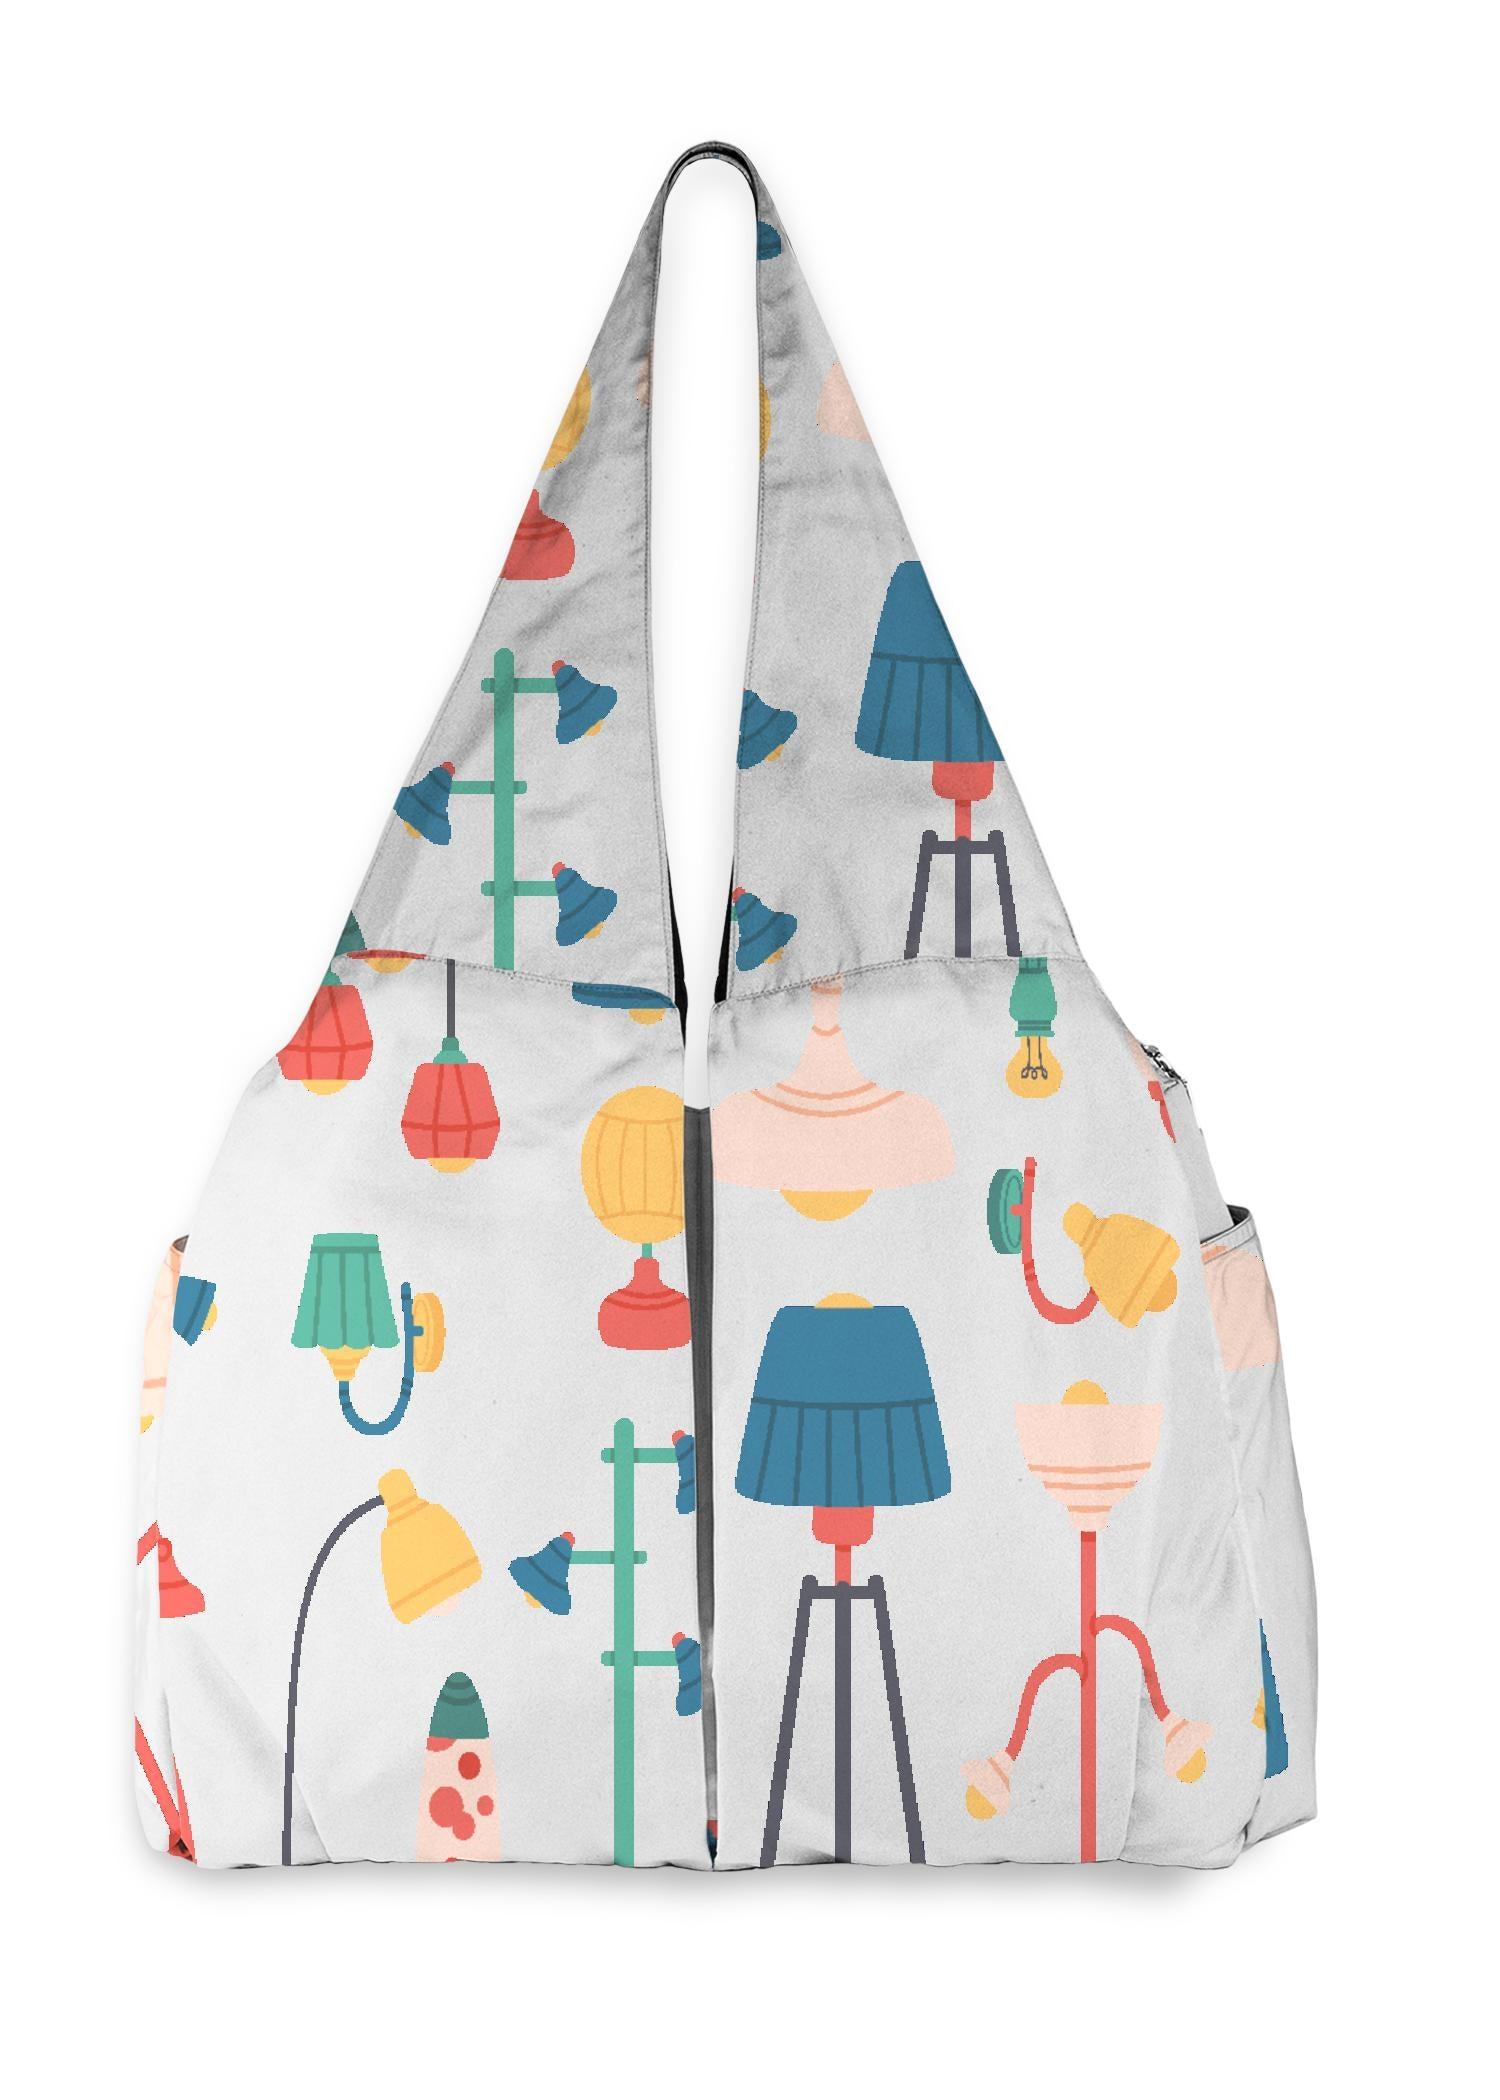 VIDA Studio Bag - Home Light by VIDA Original Artist  - Size: One Size